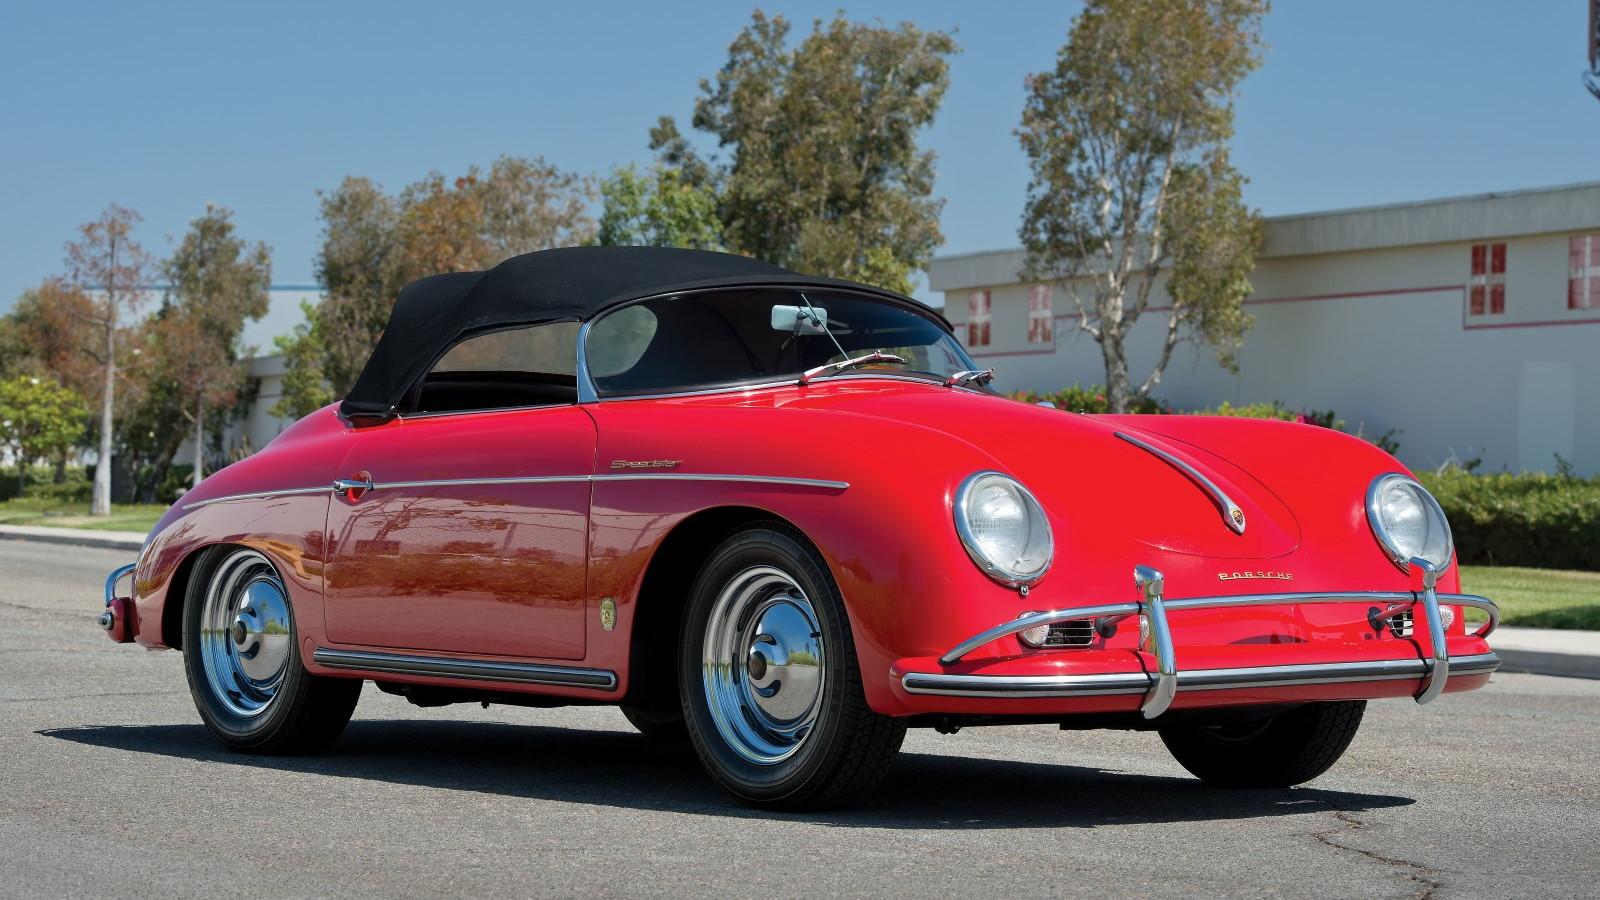 1958 Porsche 356A Speedster (Image: Auctions America)